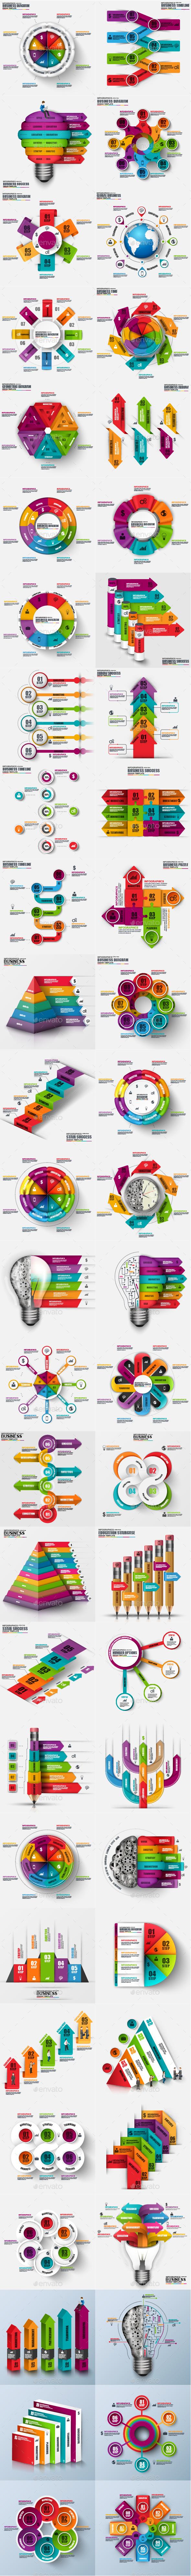 Big Set Infographic Templates